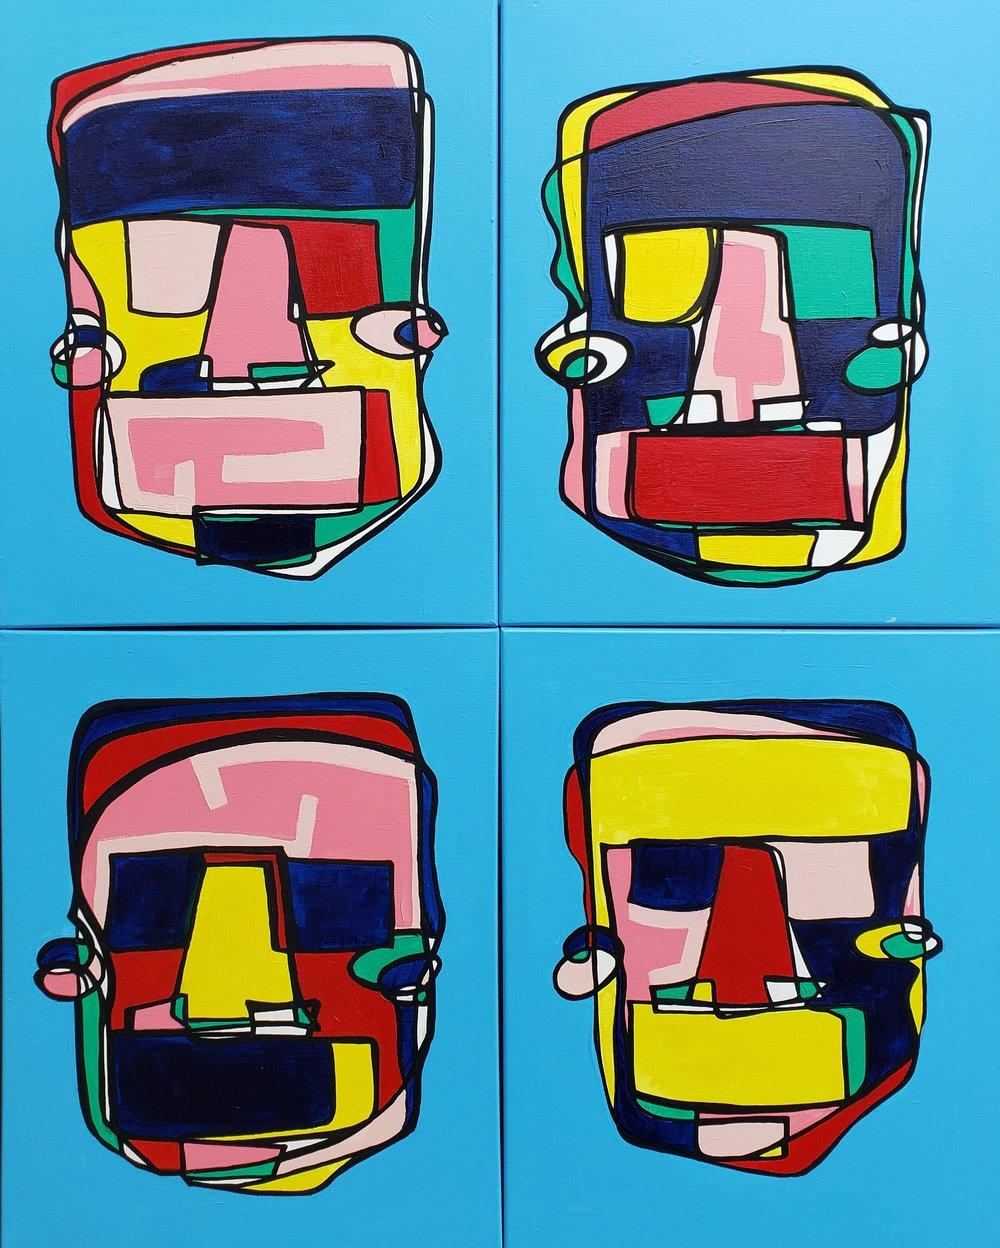 Pastel People /  40 x 32 Set of 4 ( 20 x 16 ) / Mixed Media / 2019